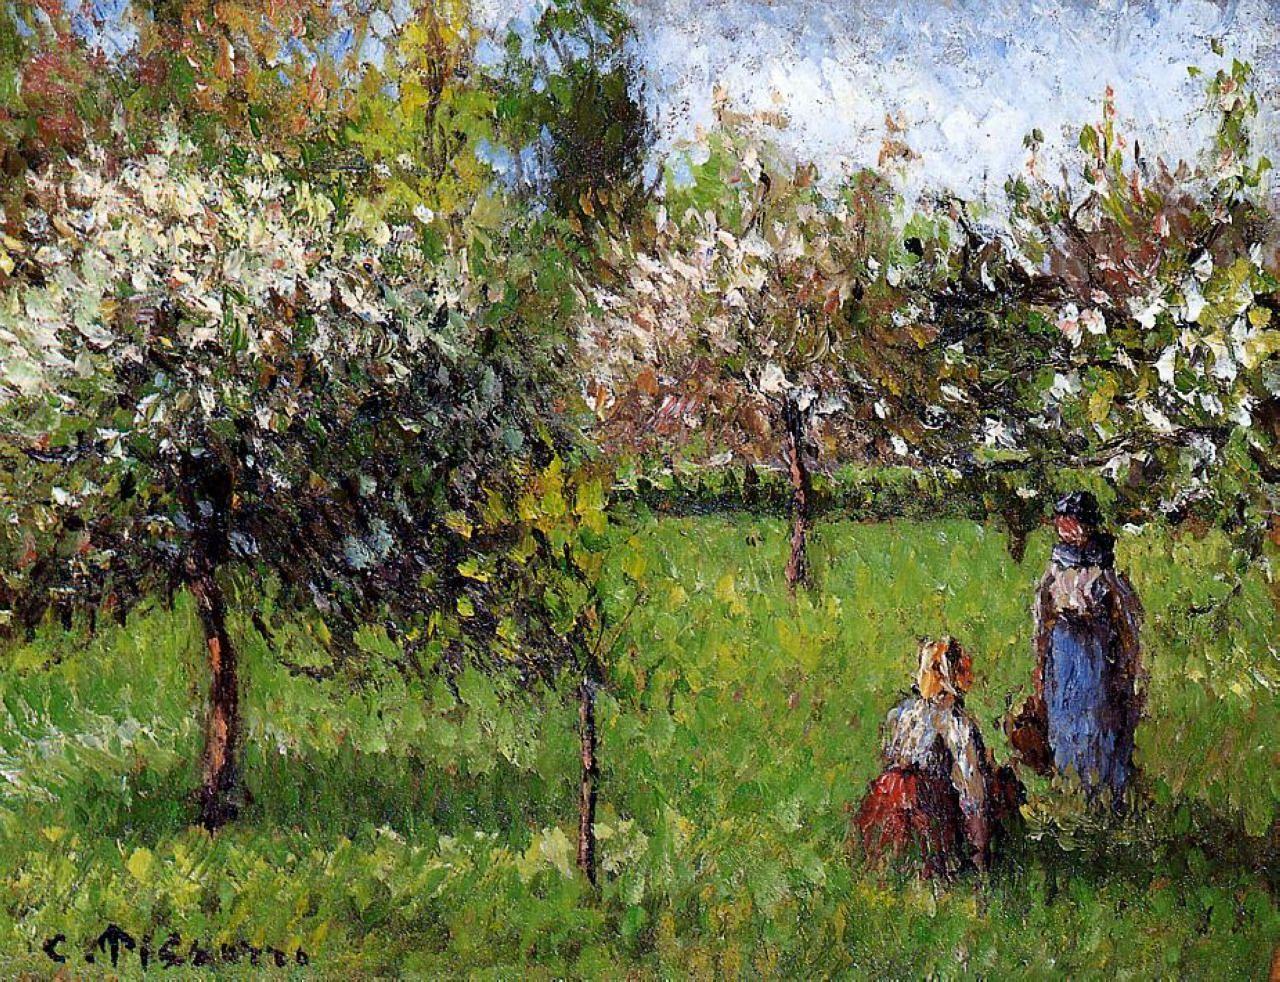 impressionism-art-blog:    Apple Blossoms Eragny via Camille Pissarro  Medium: oil on canvas